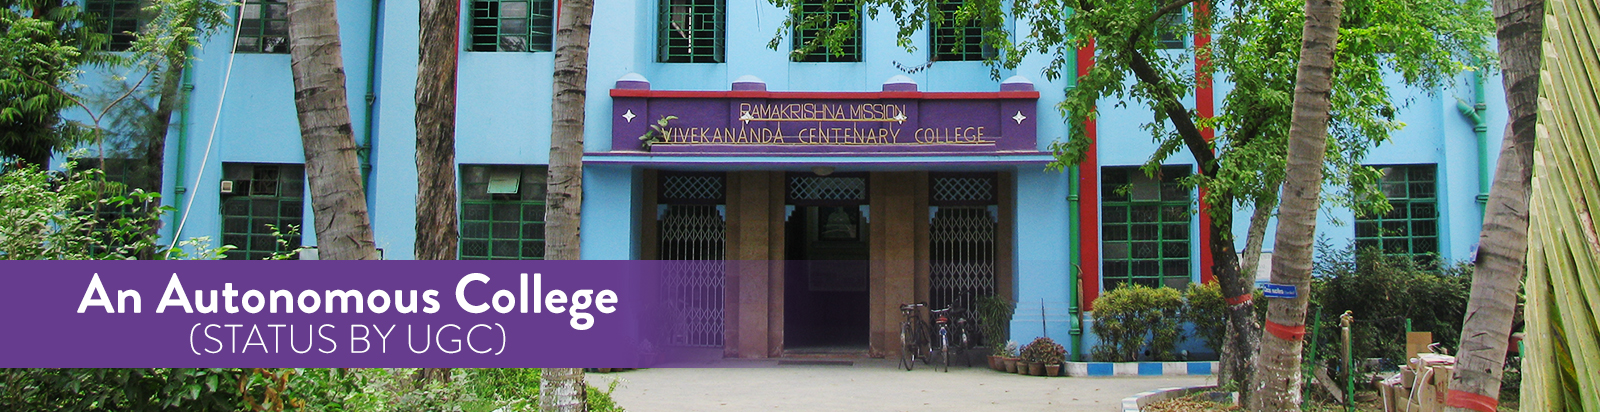 Ramakrishna Mission Vivekananda Centenary College Rahara, Kolkata Image